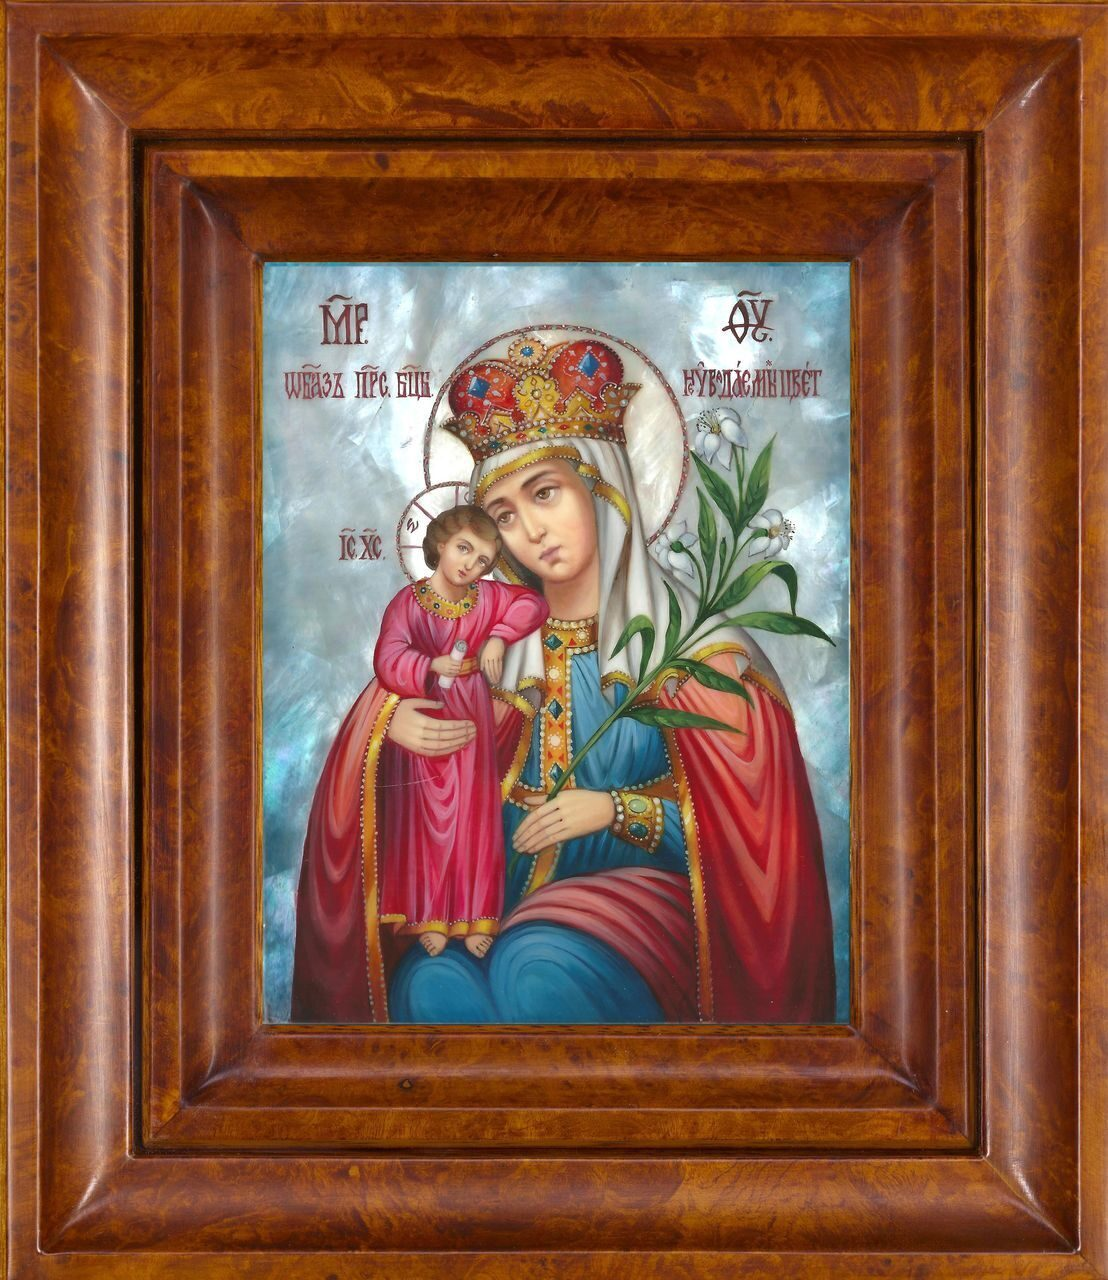 Икона божья матерь неувядаемый цвет ...: pictures11.ru/ikona-bozhya-mater-neuvyadaemyj-cvet.html